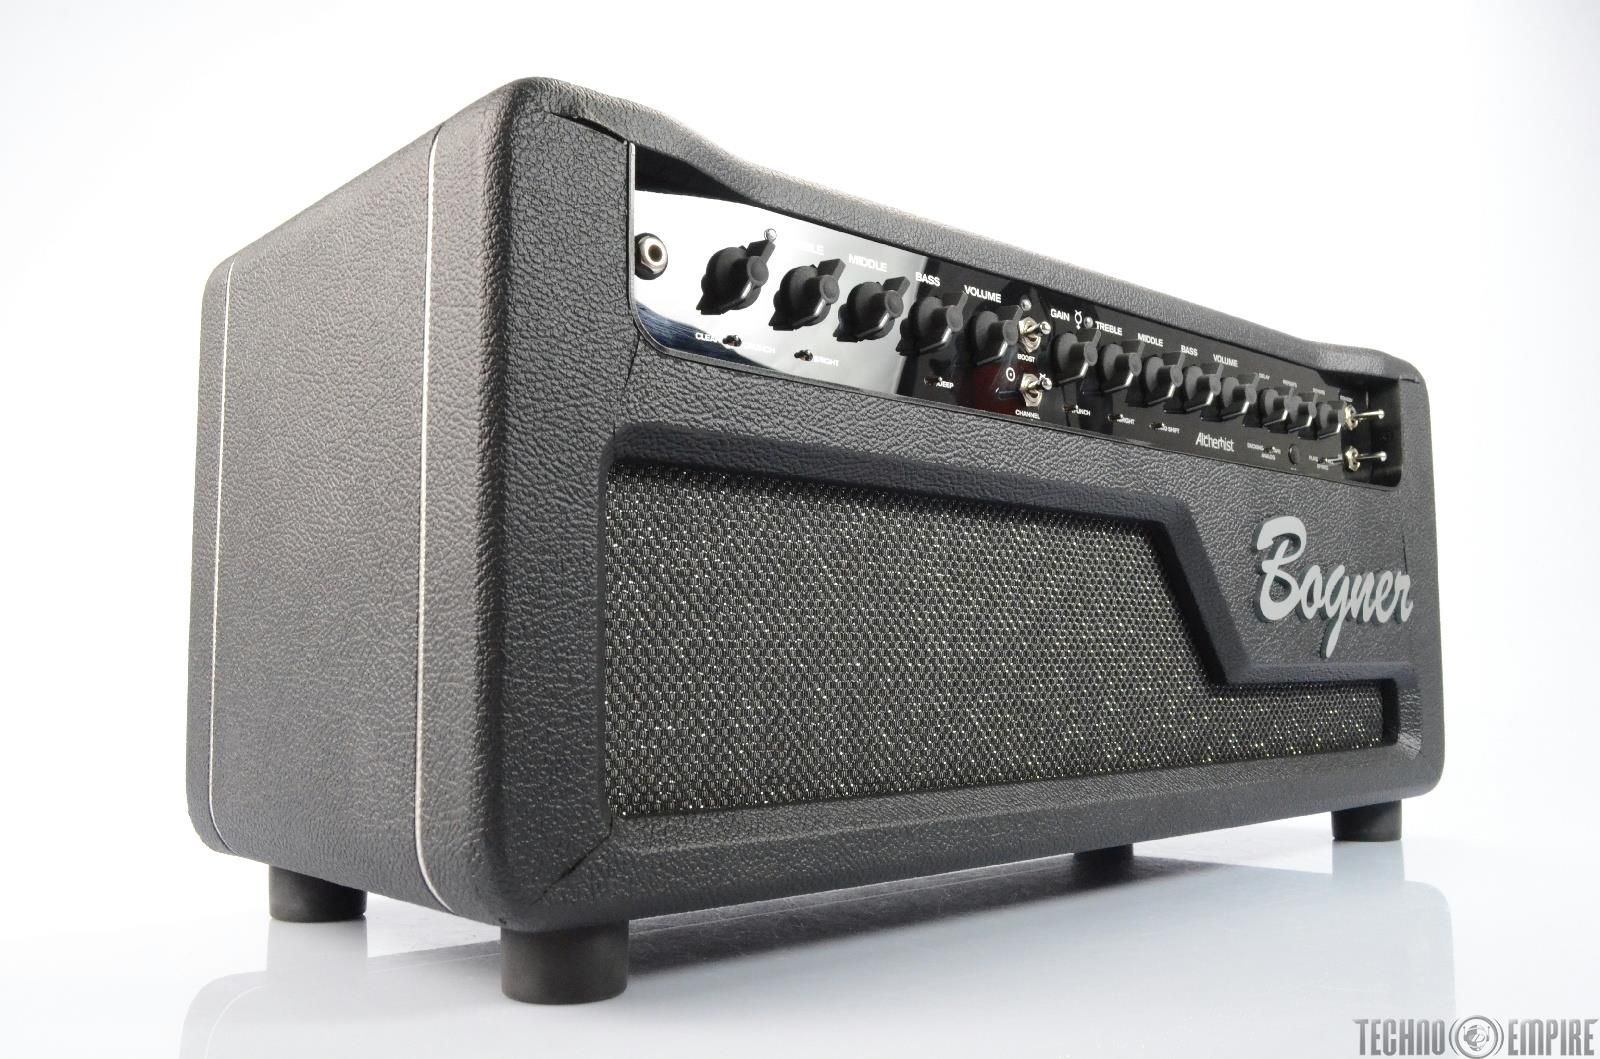 bogner alchemist 40 20 watt tube amplifier guitar head amp w road case 25800 ebay. Black Bedroom Furniture Sets. Home Design Ideas